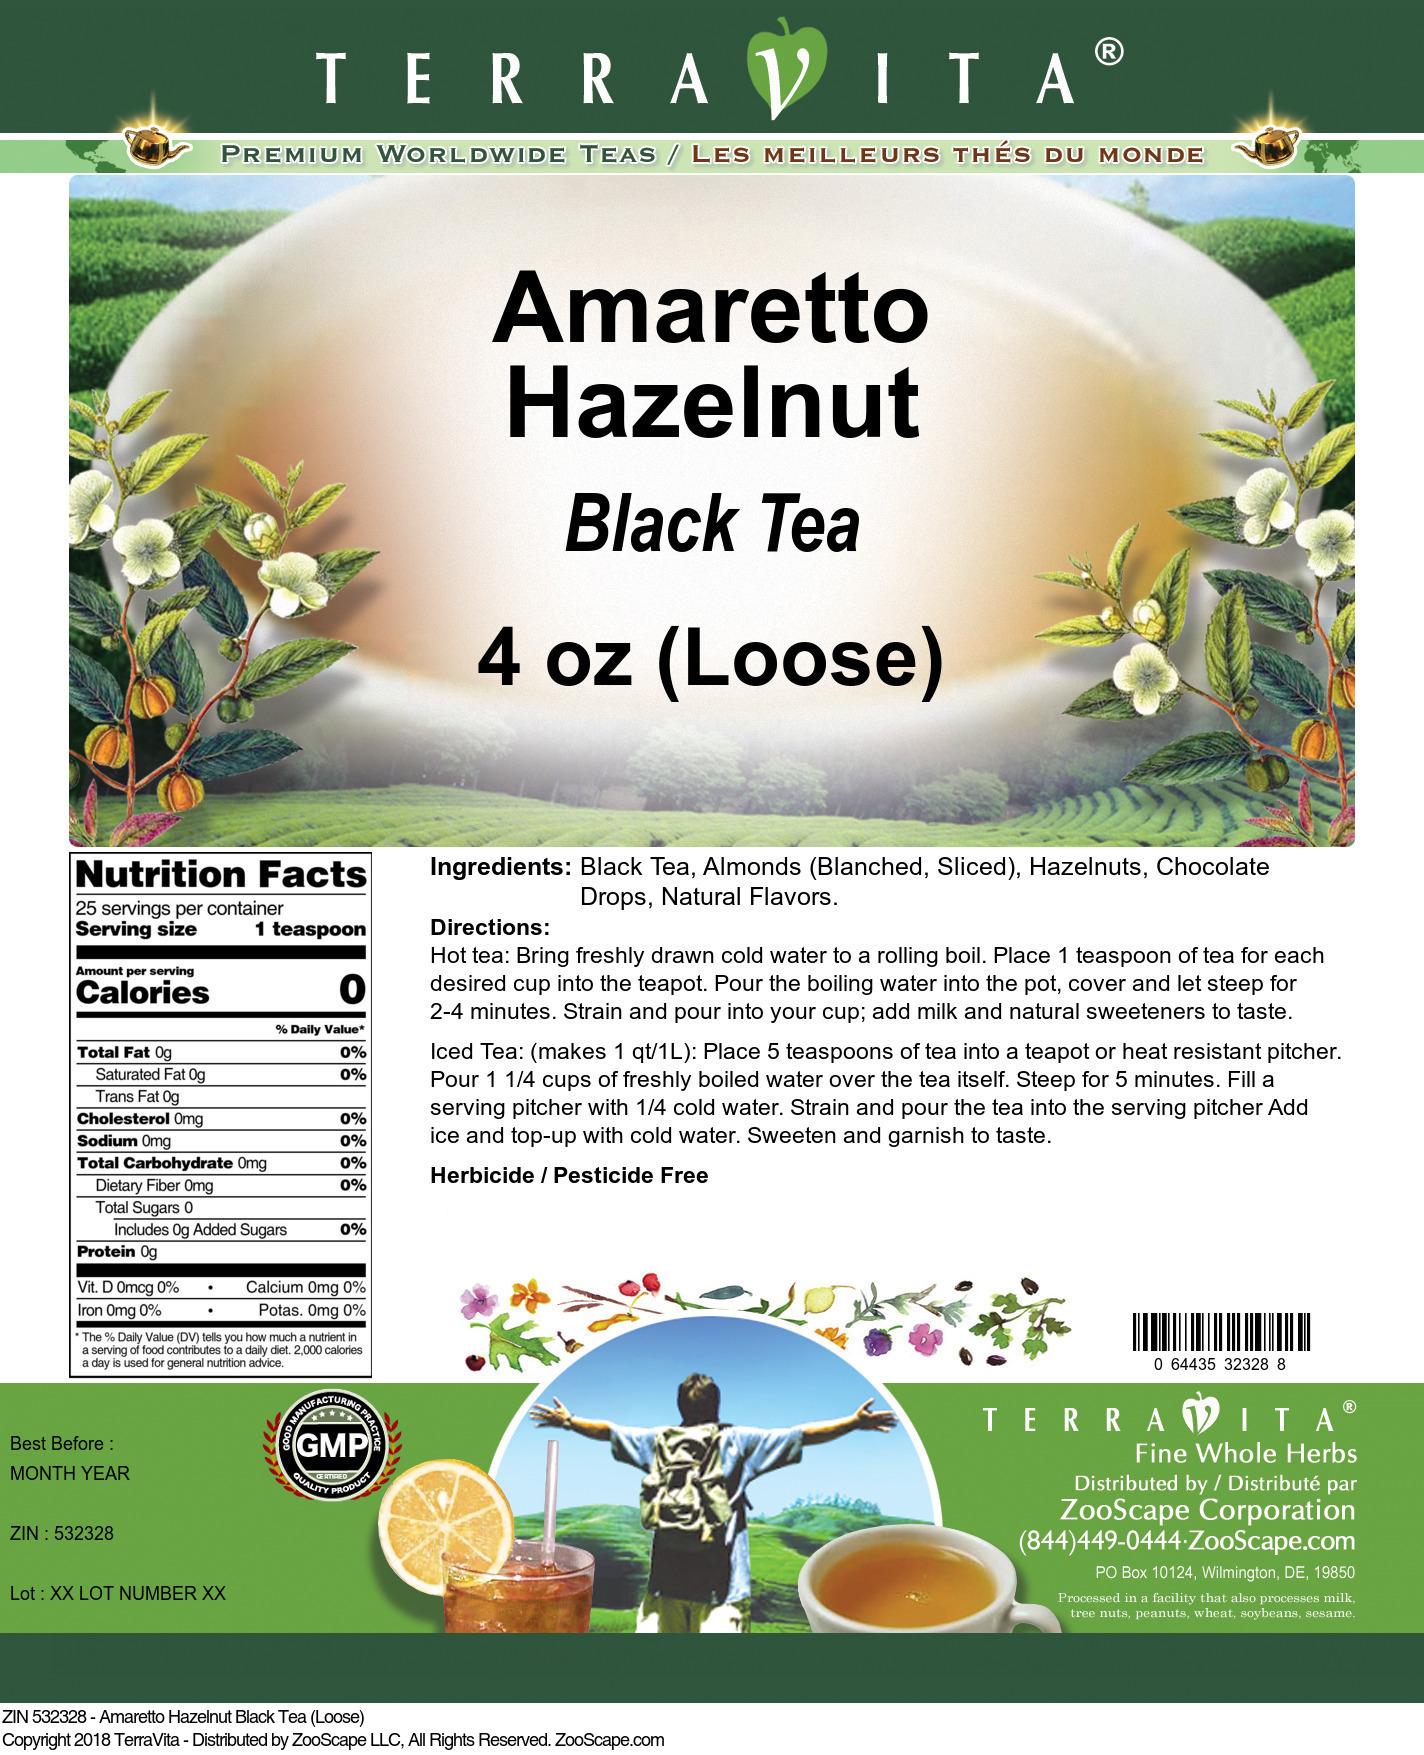 Amaretto Hazelnut Black Tea